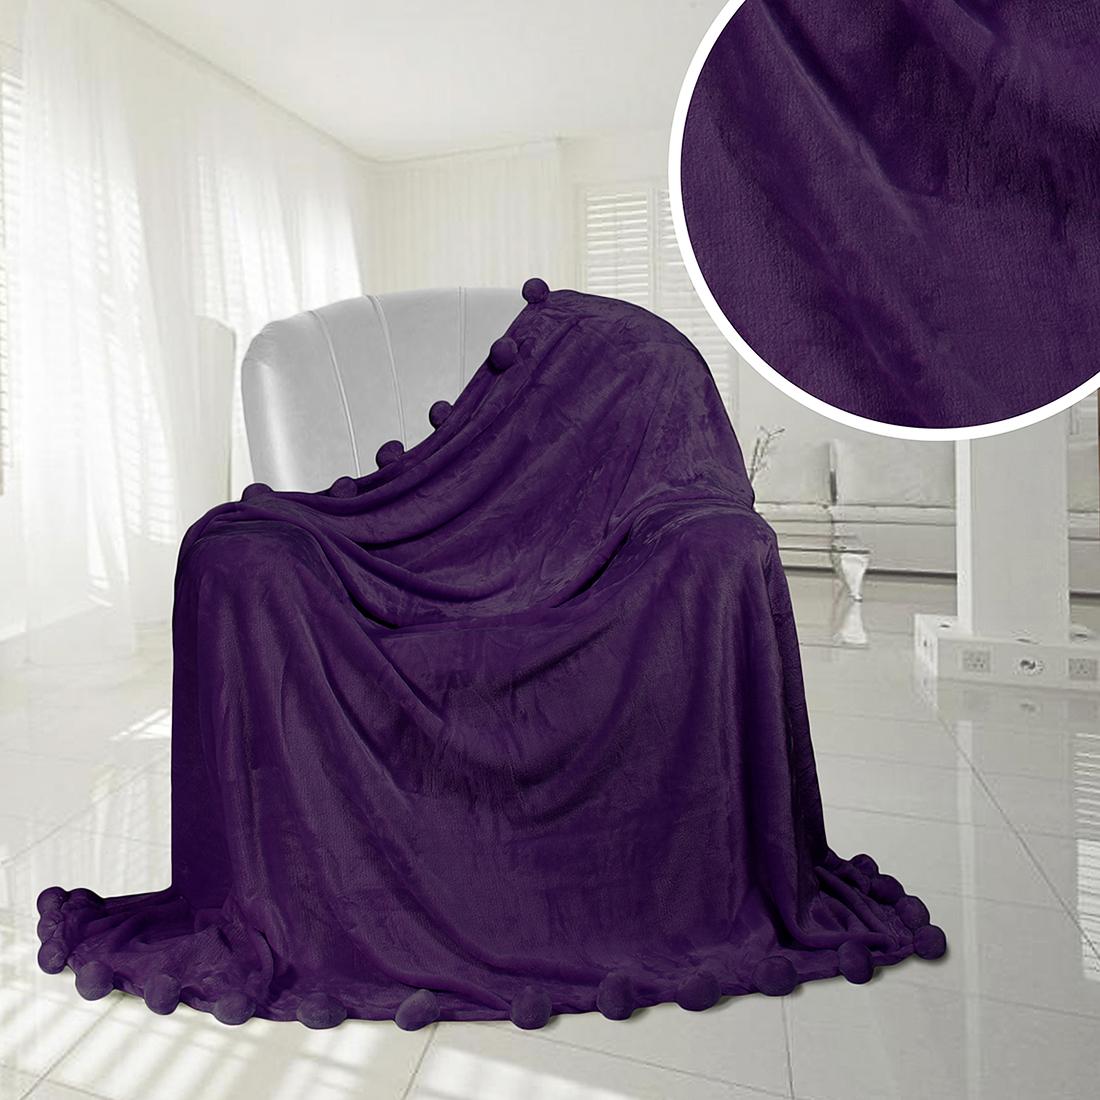 Плед Eleganta Плед Помпон Цвет: Фиолетовый (210х220 см) плед eleganta плед помпон цвет фиолетовый 210х220 см